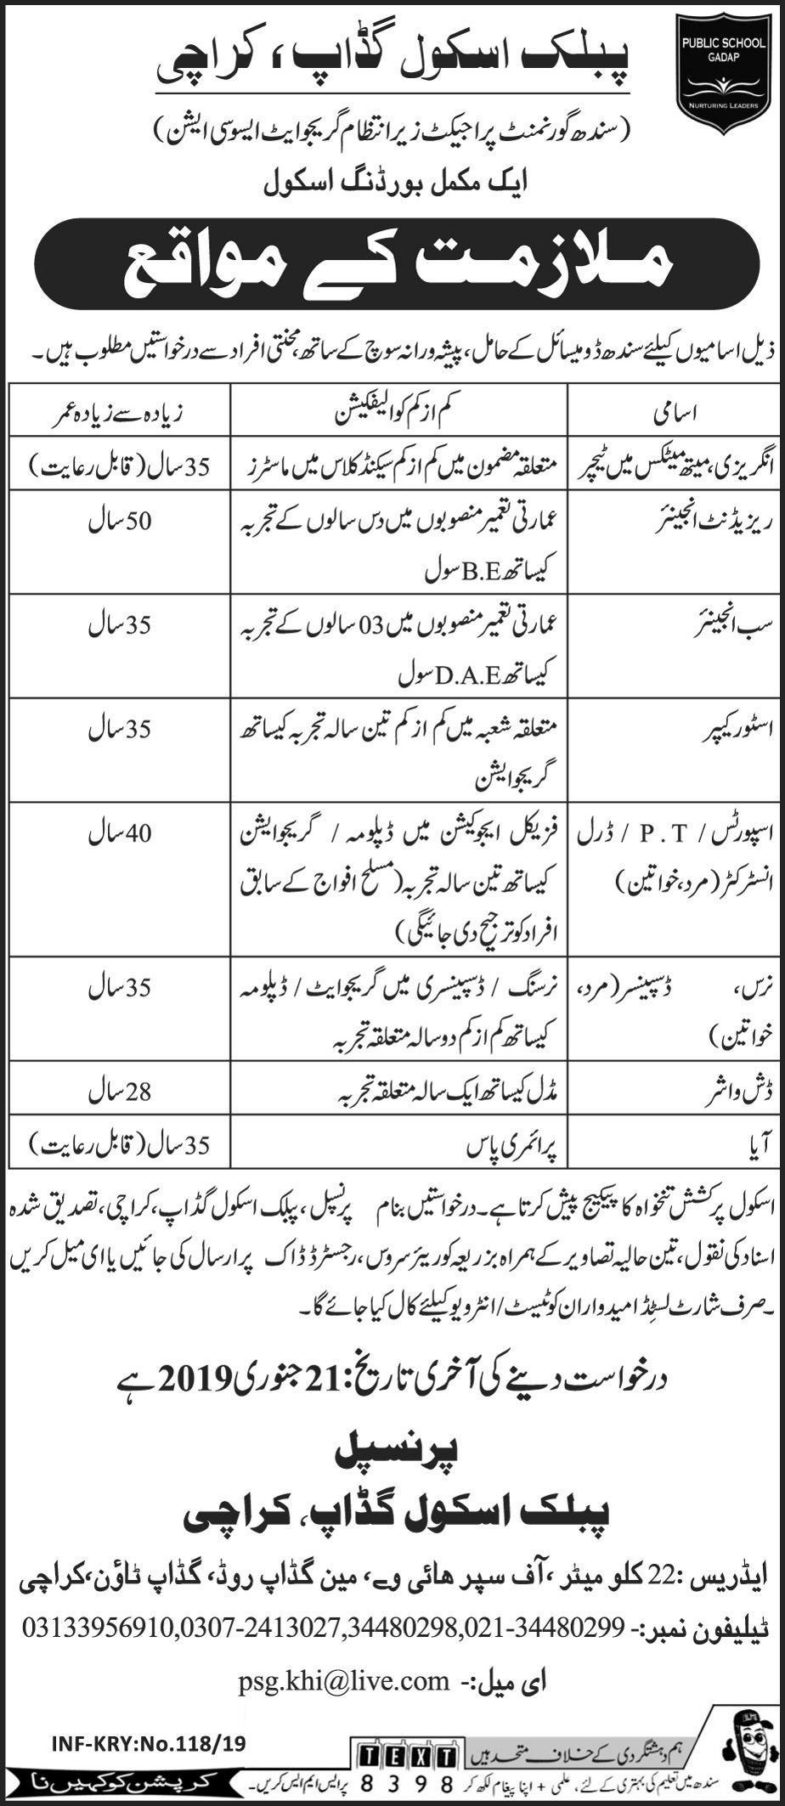 Public School Gadap Karachi Jobs 2019 for Engineers, Sport/PTI, Nurse and Teachers